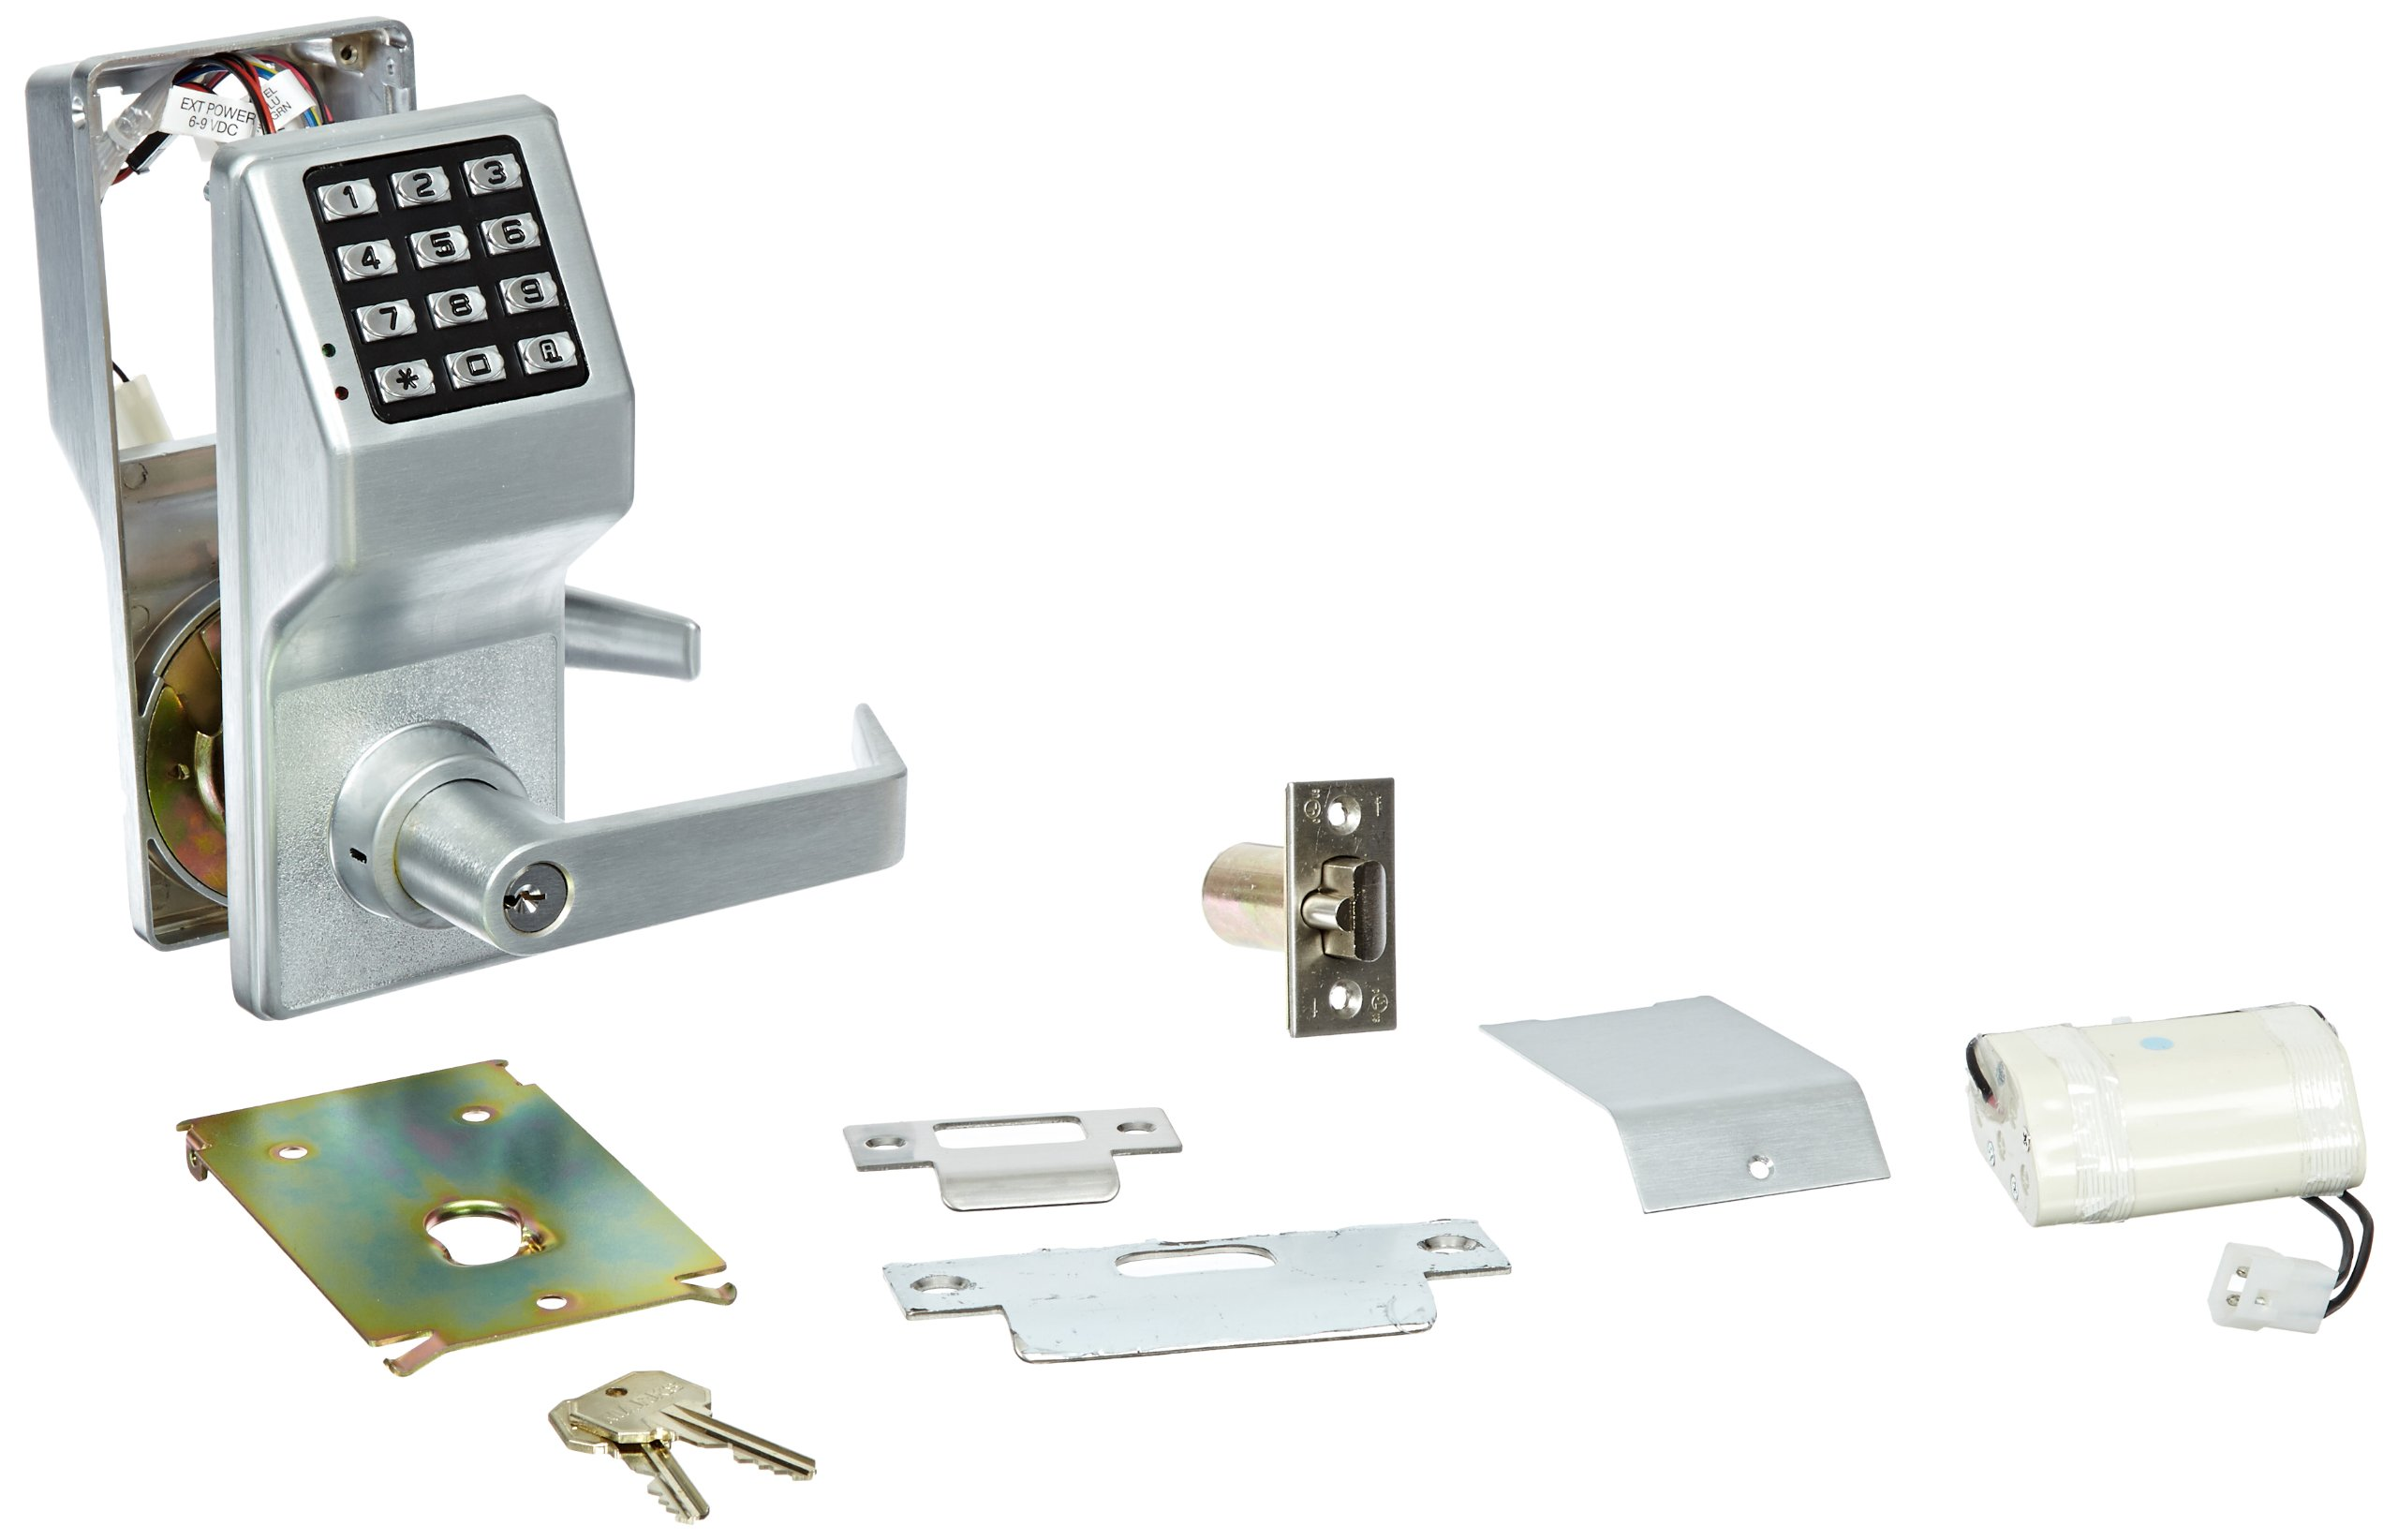 Alarm Lock Trilogy T2 100-User Weatherproof Electronic Digital Keypad Cylindrical Lock Leverset, Satin Chrome Finish